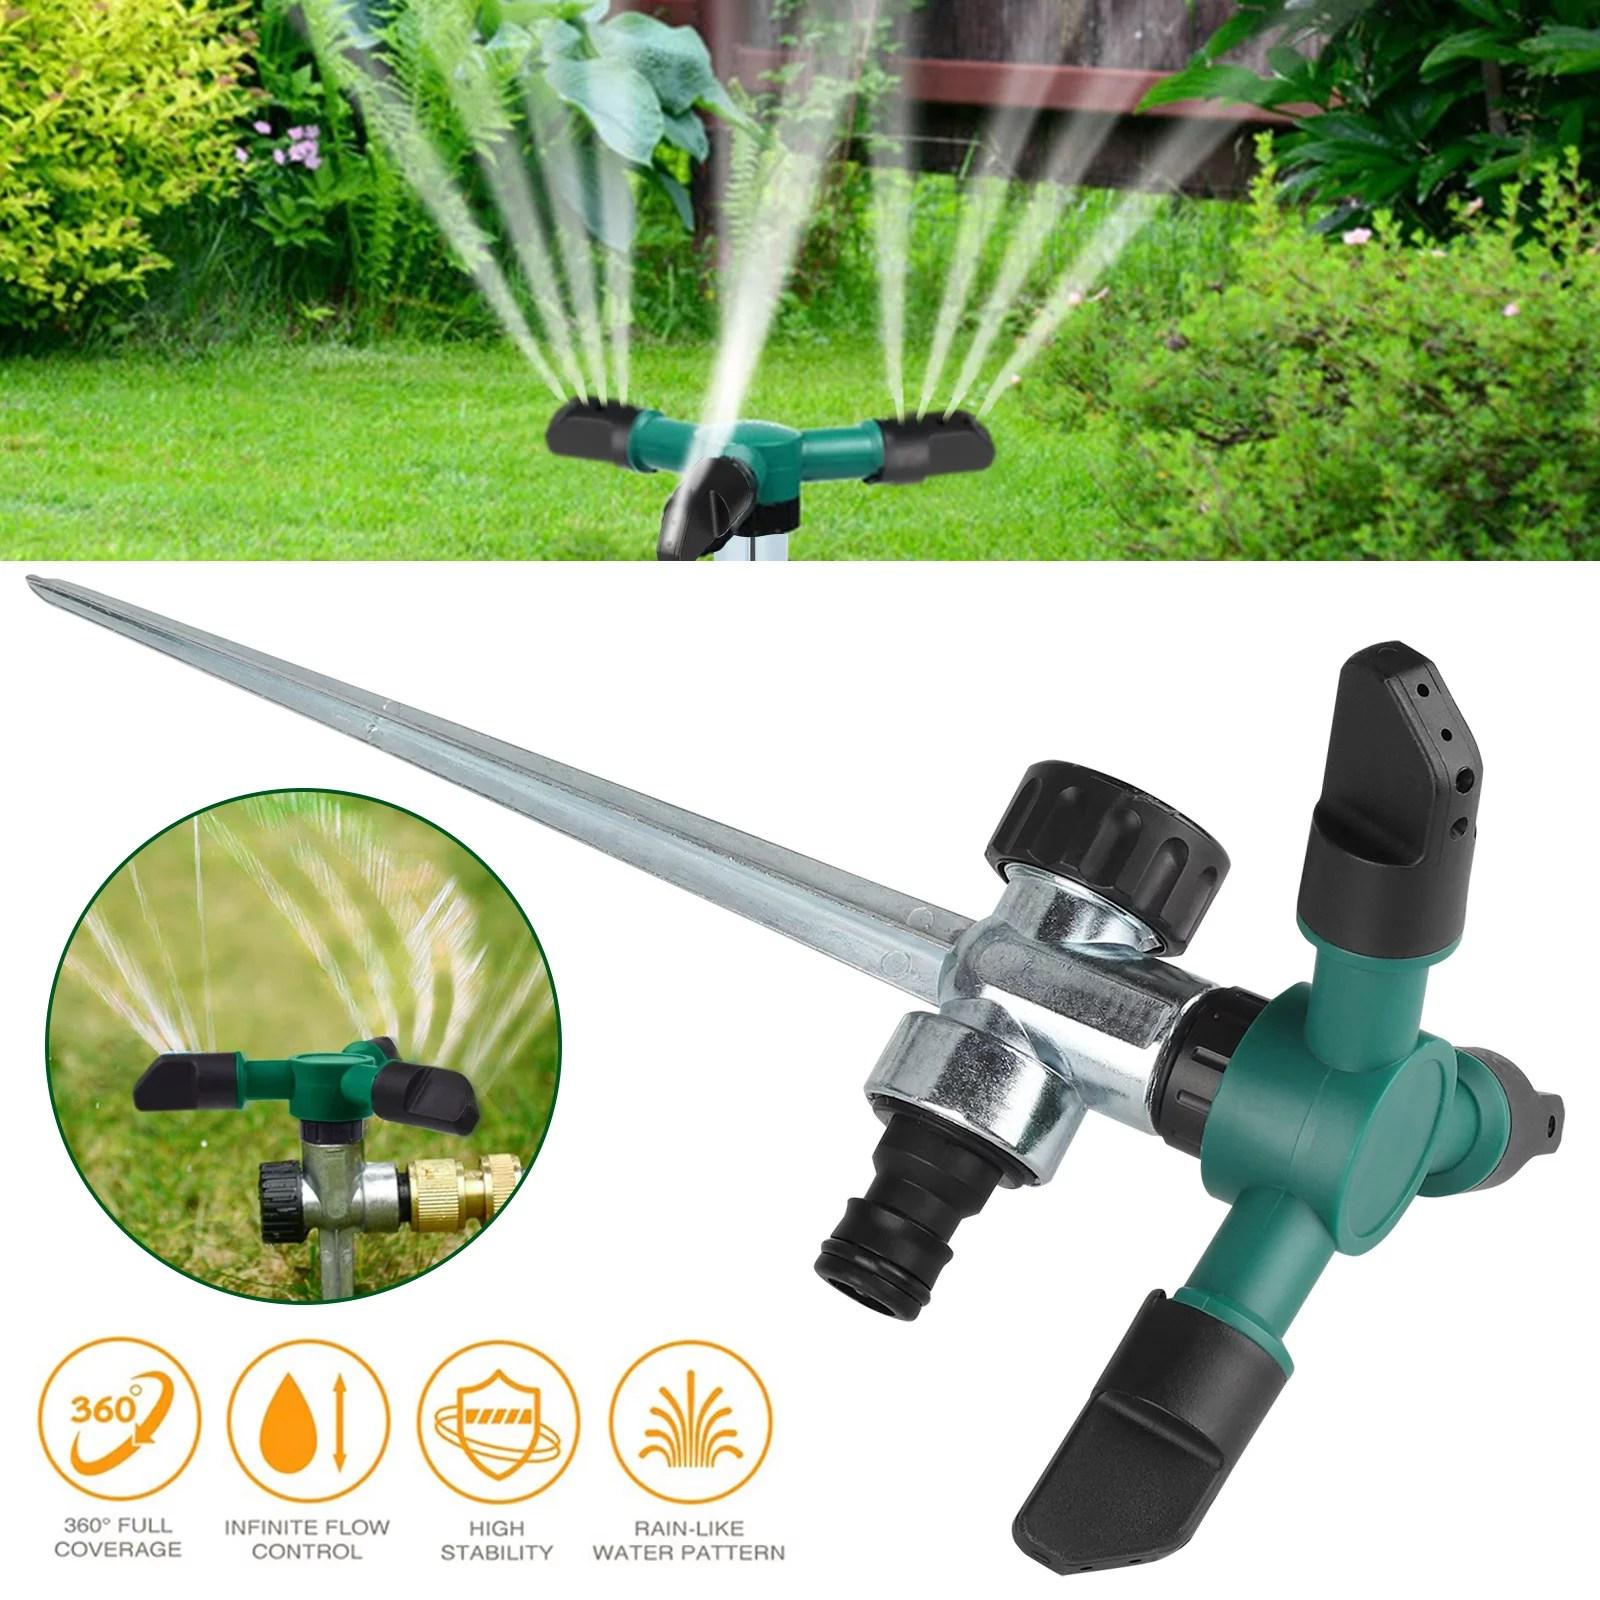 Lawn Sprinkler Automatic 360 Rotating Adjustable Kids